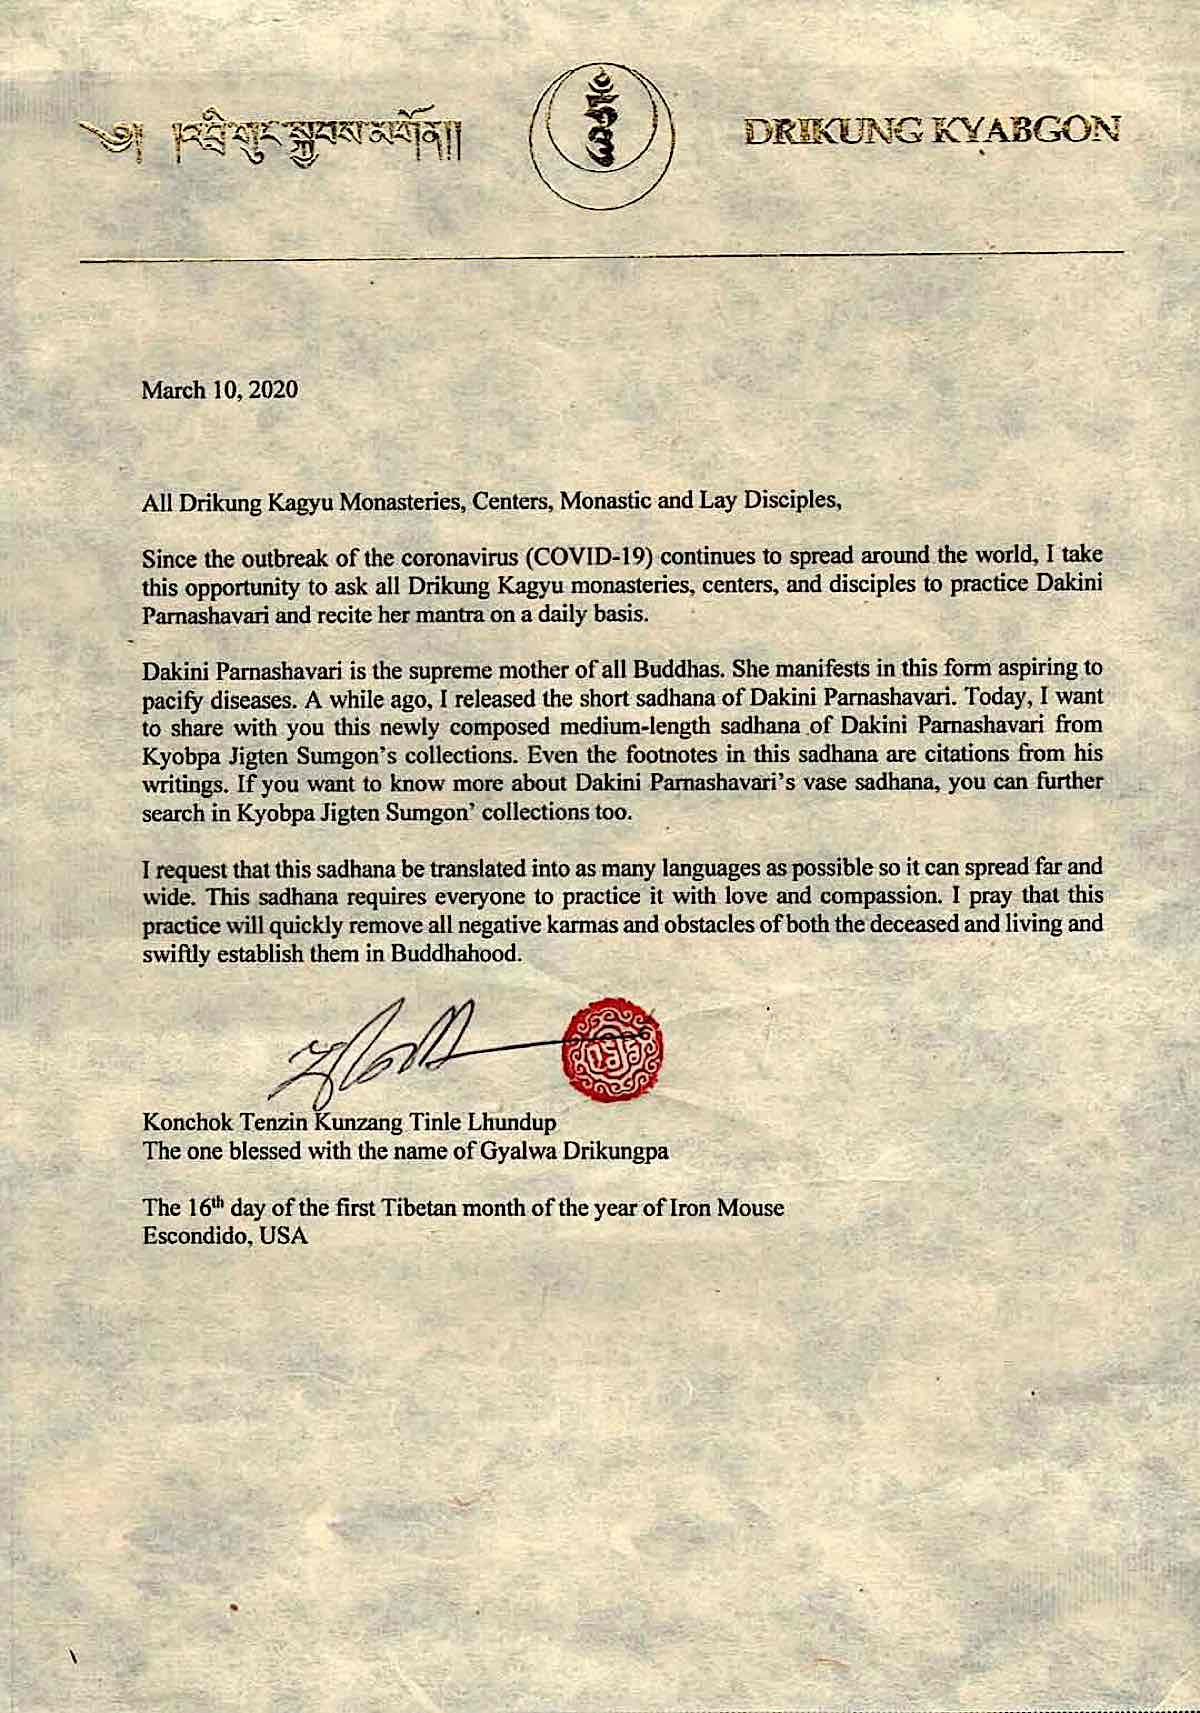 Buddha Weekly HH Letter letter Covid 19 Parnashavari Drikung Kyabgon Buddhism